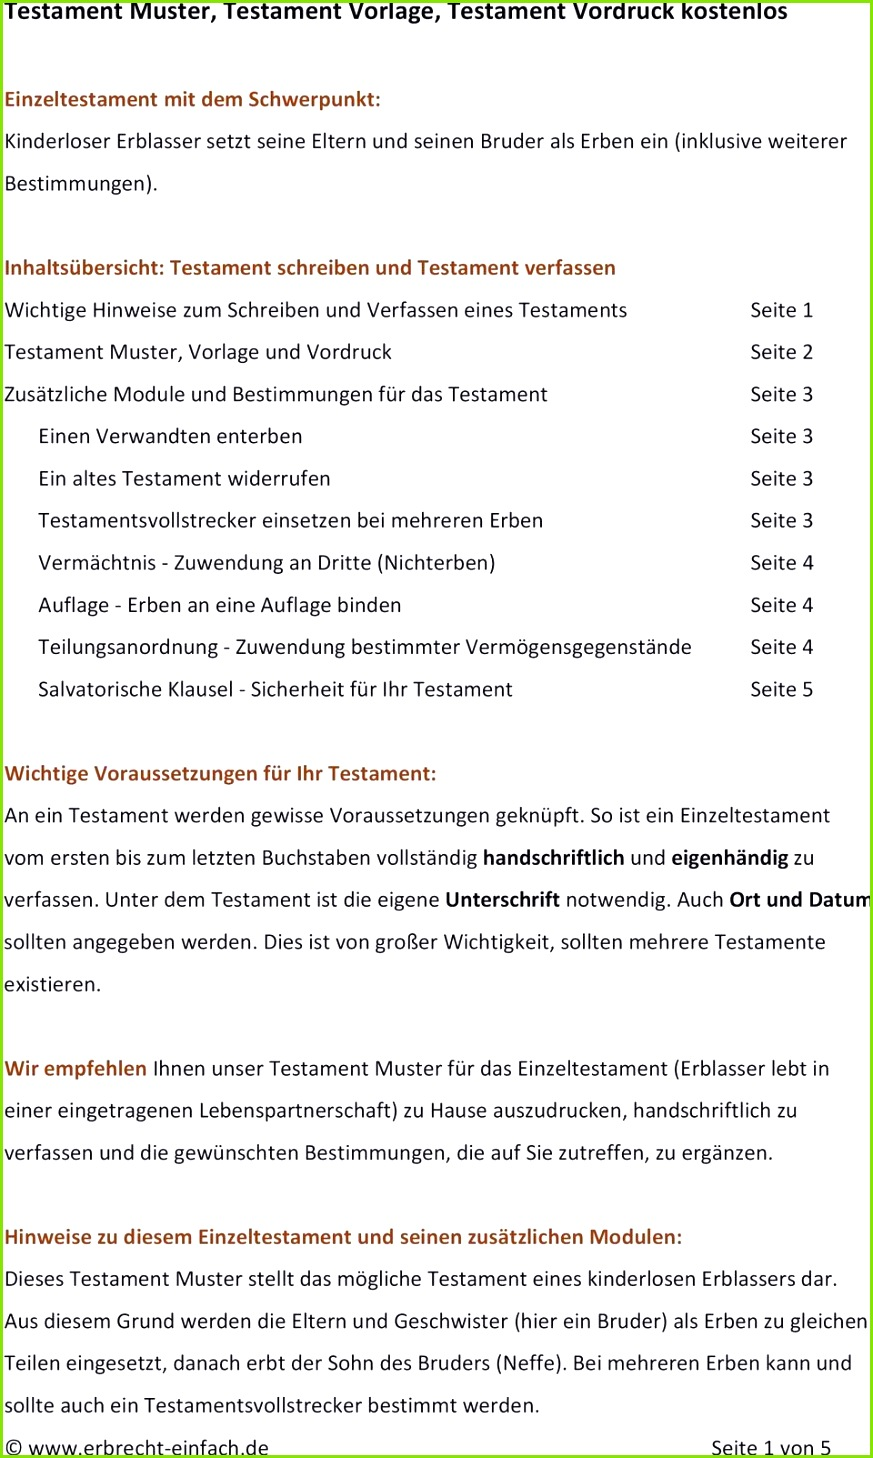 Berliner Testament Muster Kostenlos twowaves